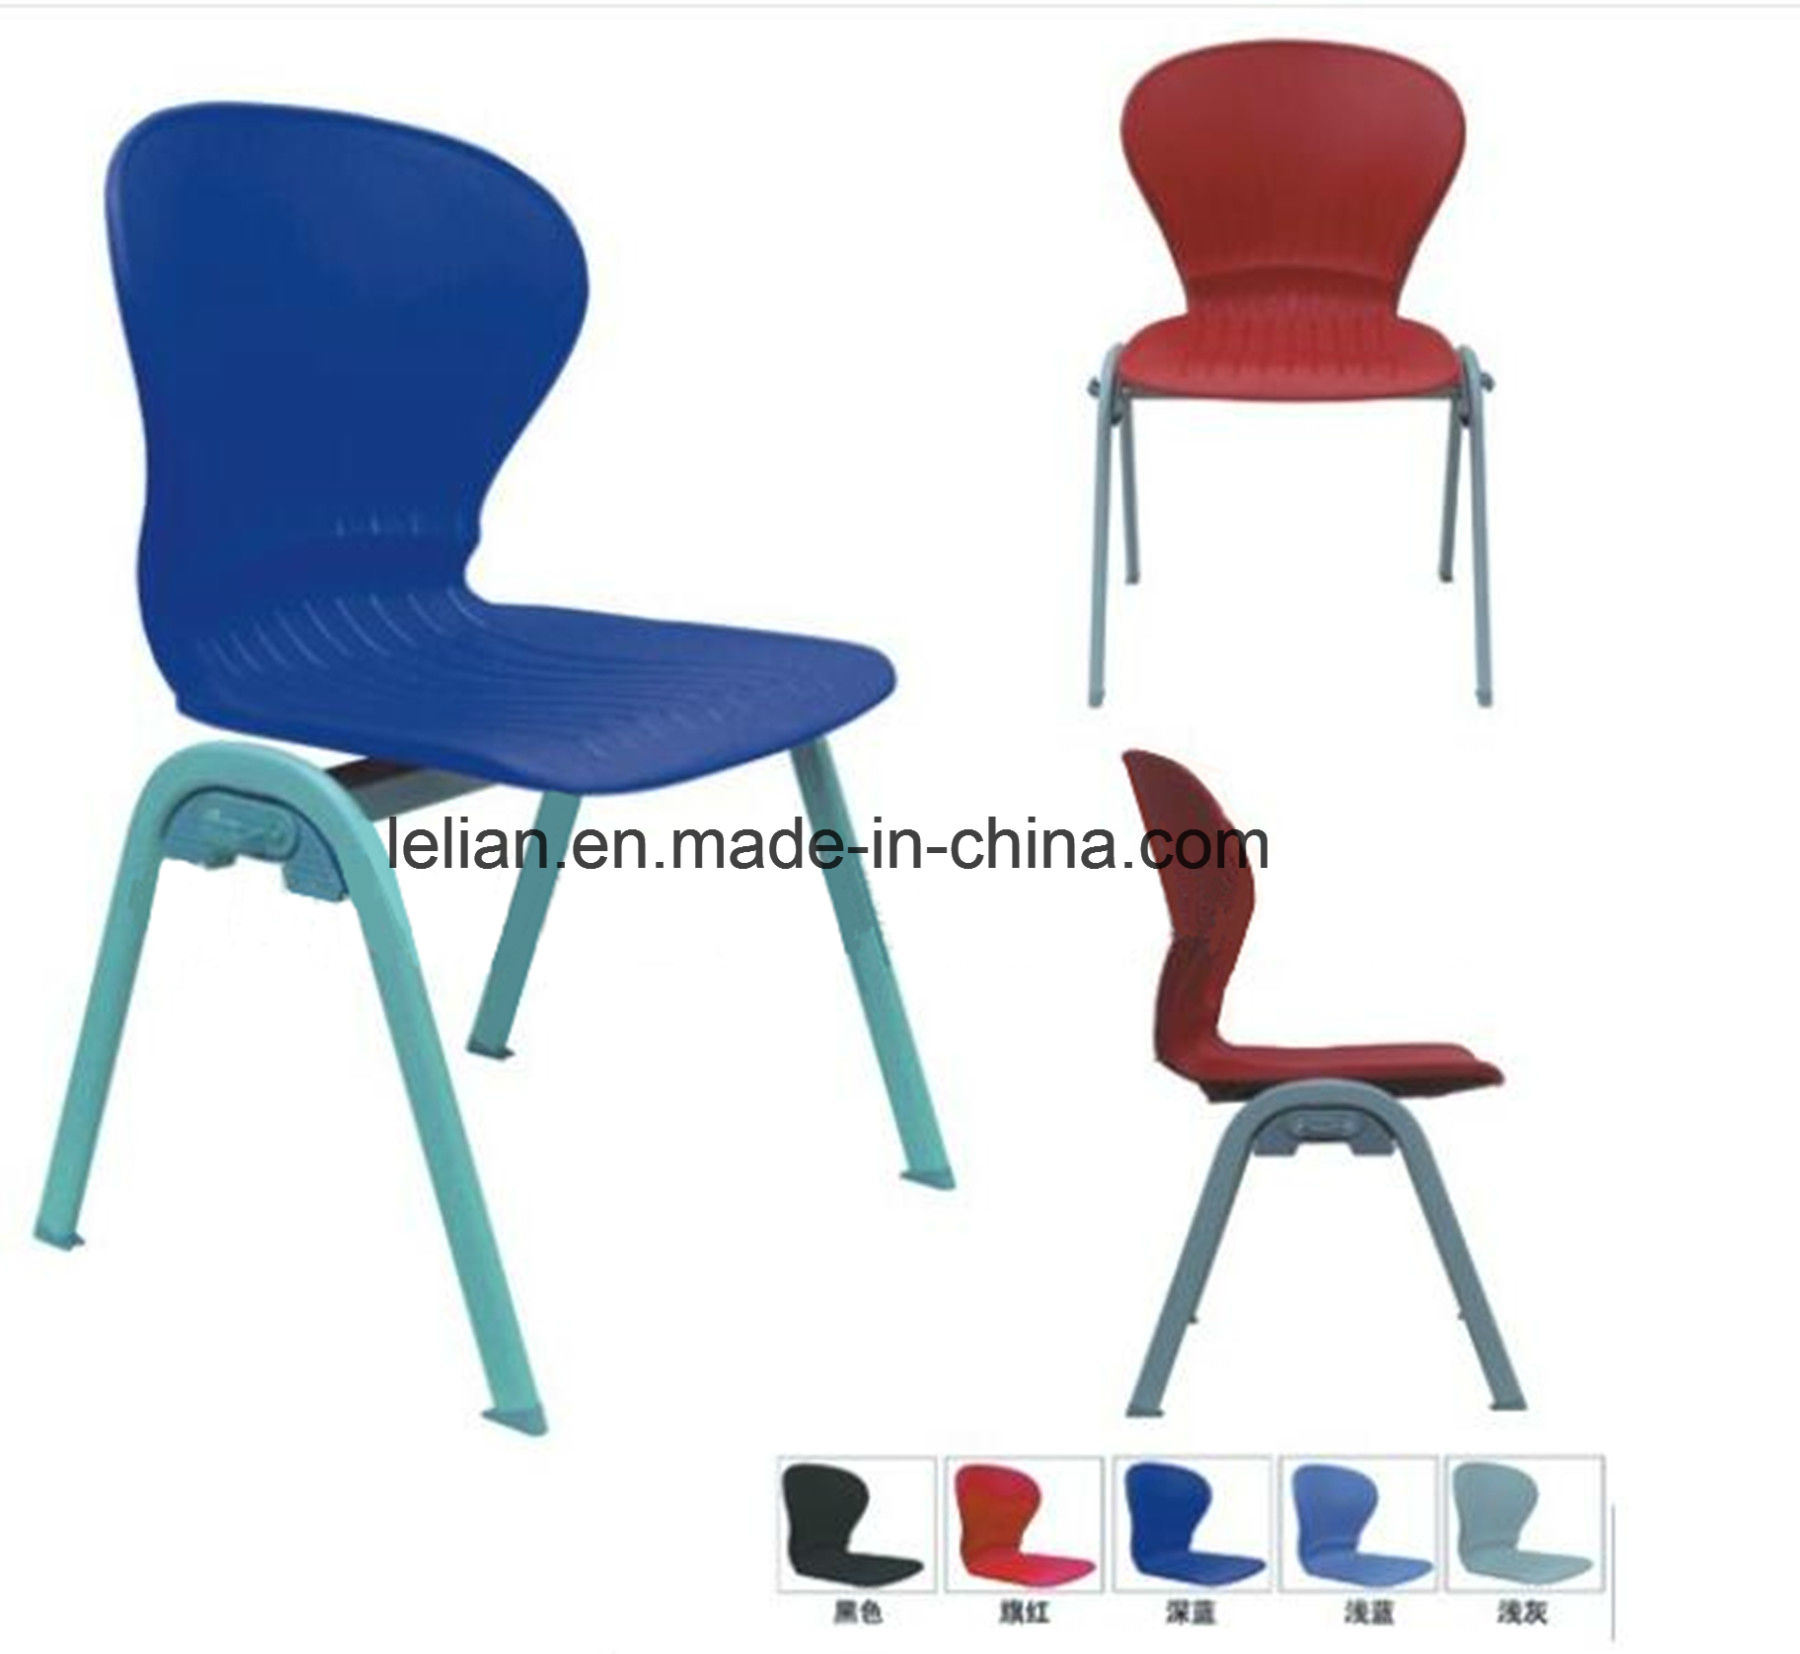 Hercules Series 551 Lb. Capacity Blue Stack Chair (LL-0008)